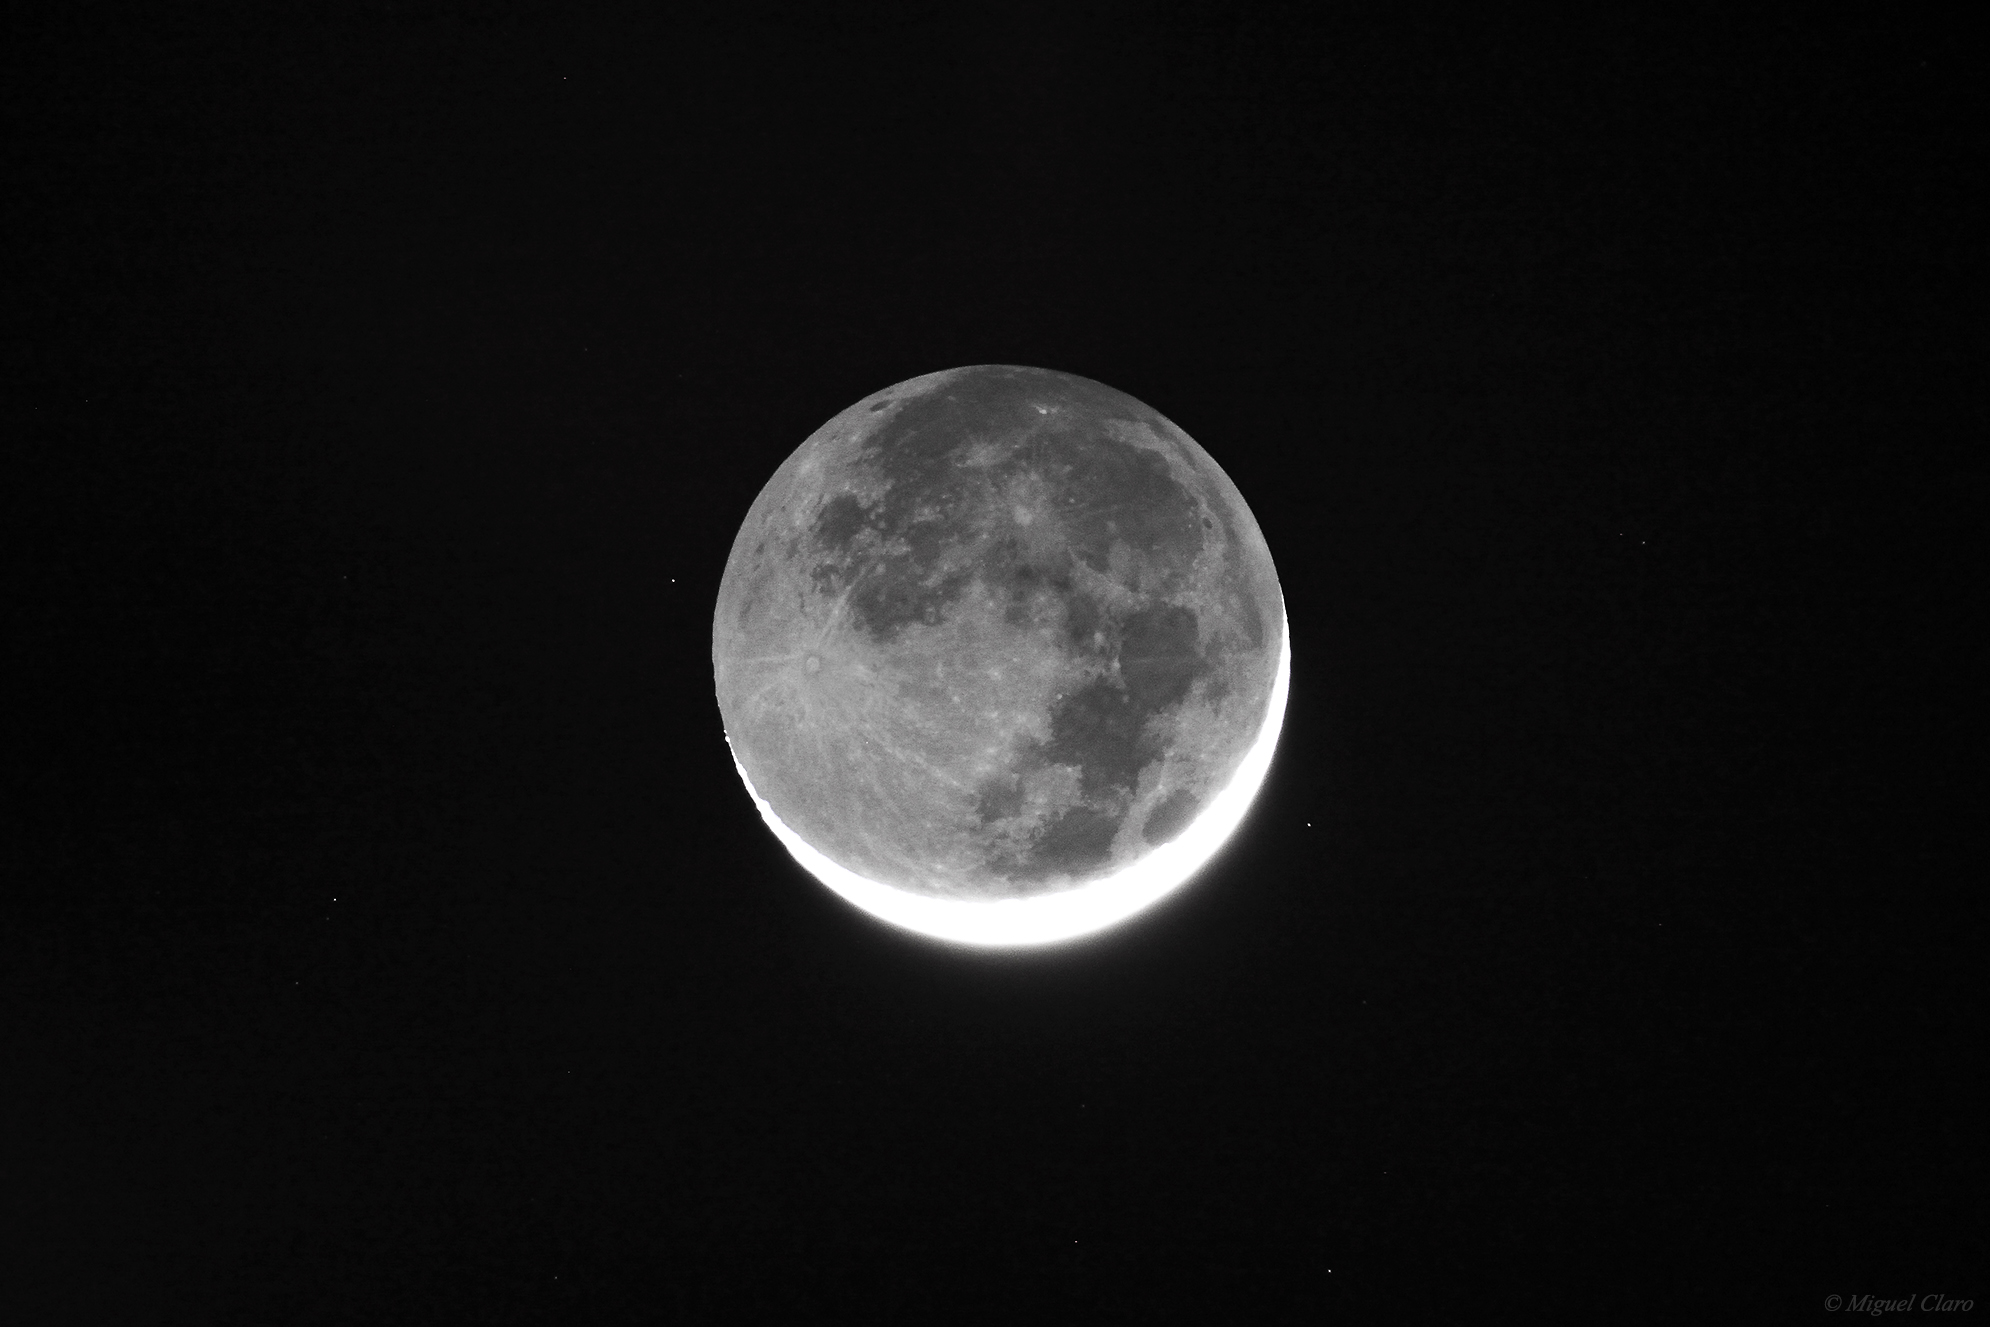 <h5>Moon Earthshine – The Leonardo Da Vinci phenomenon</h5>